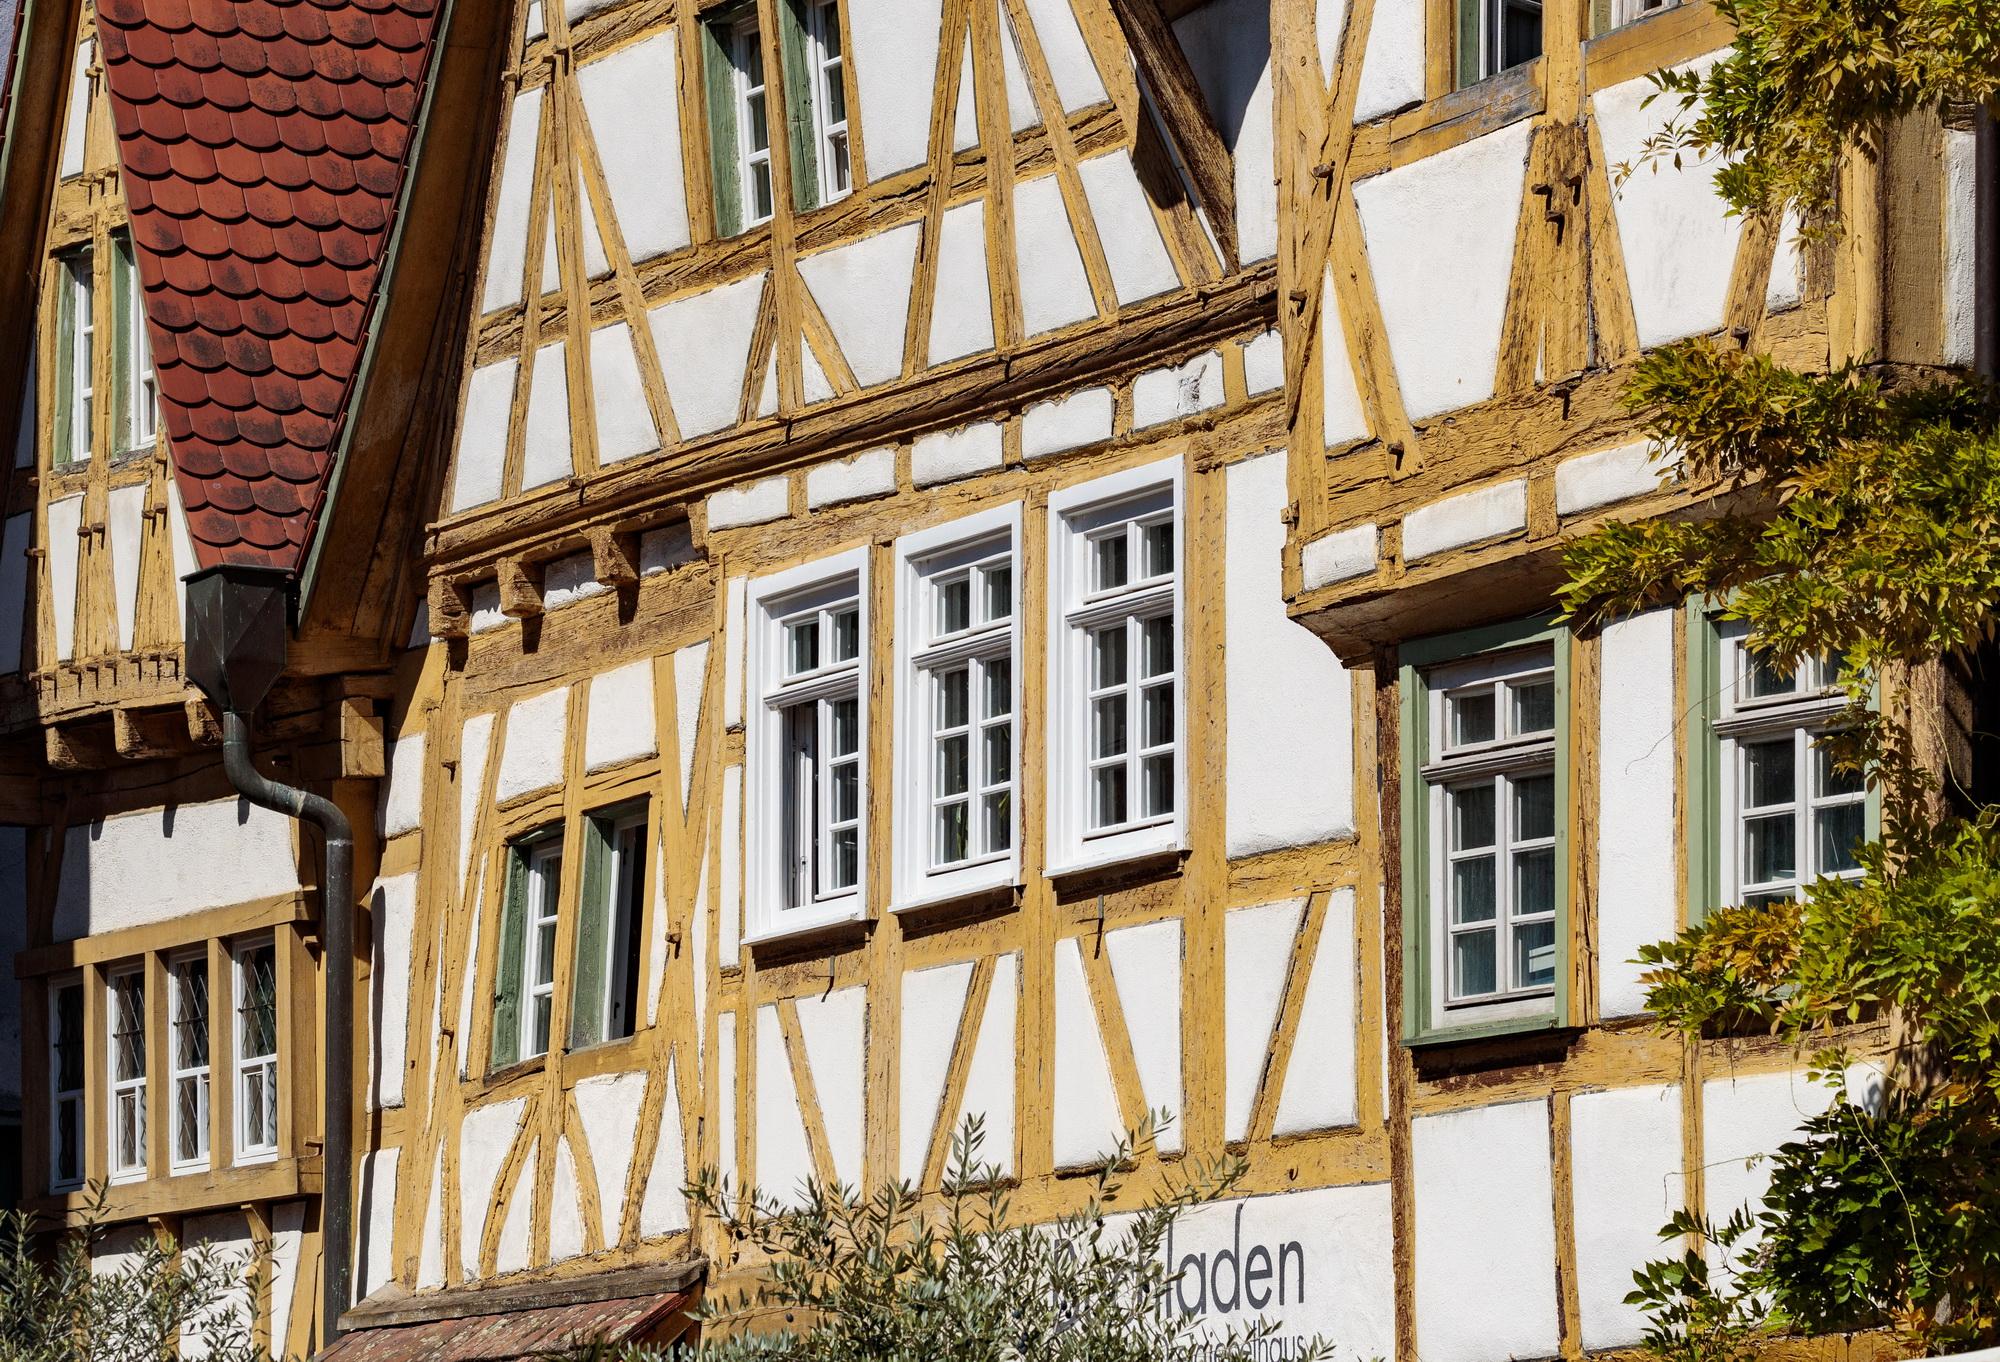 Besigheim: Fachwerk Dreigiebelhaus